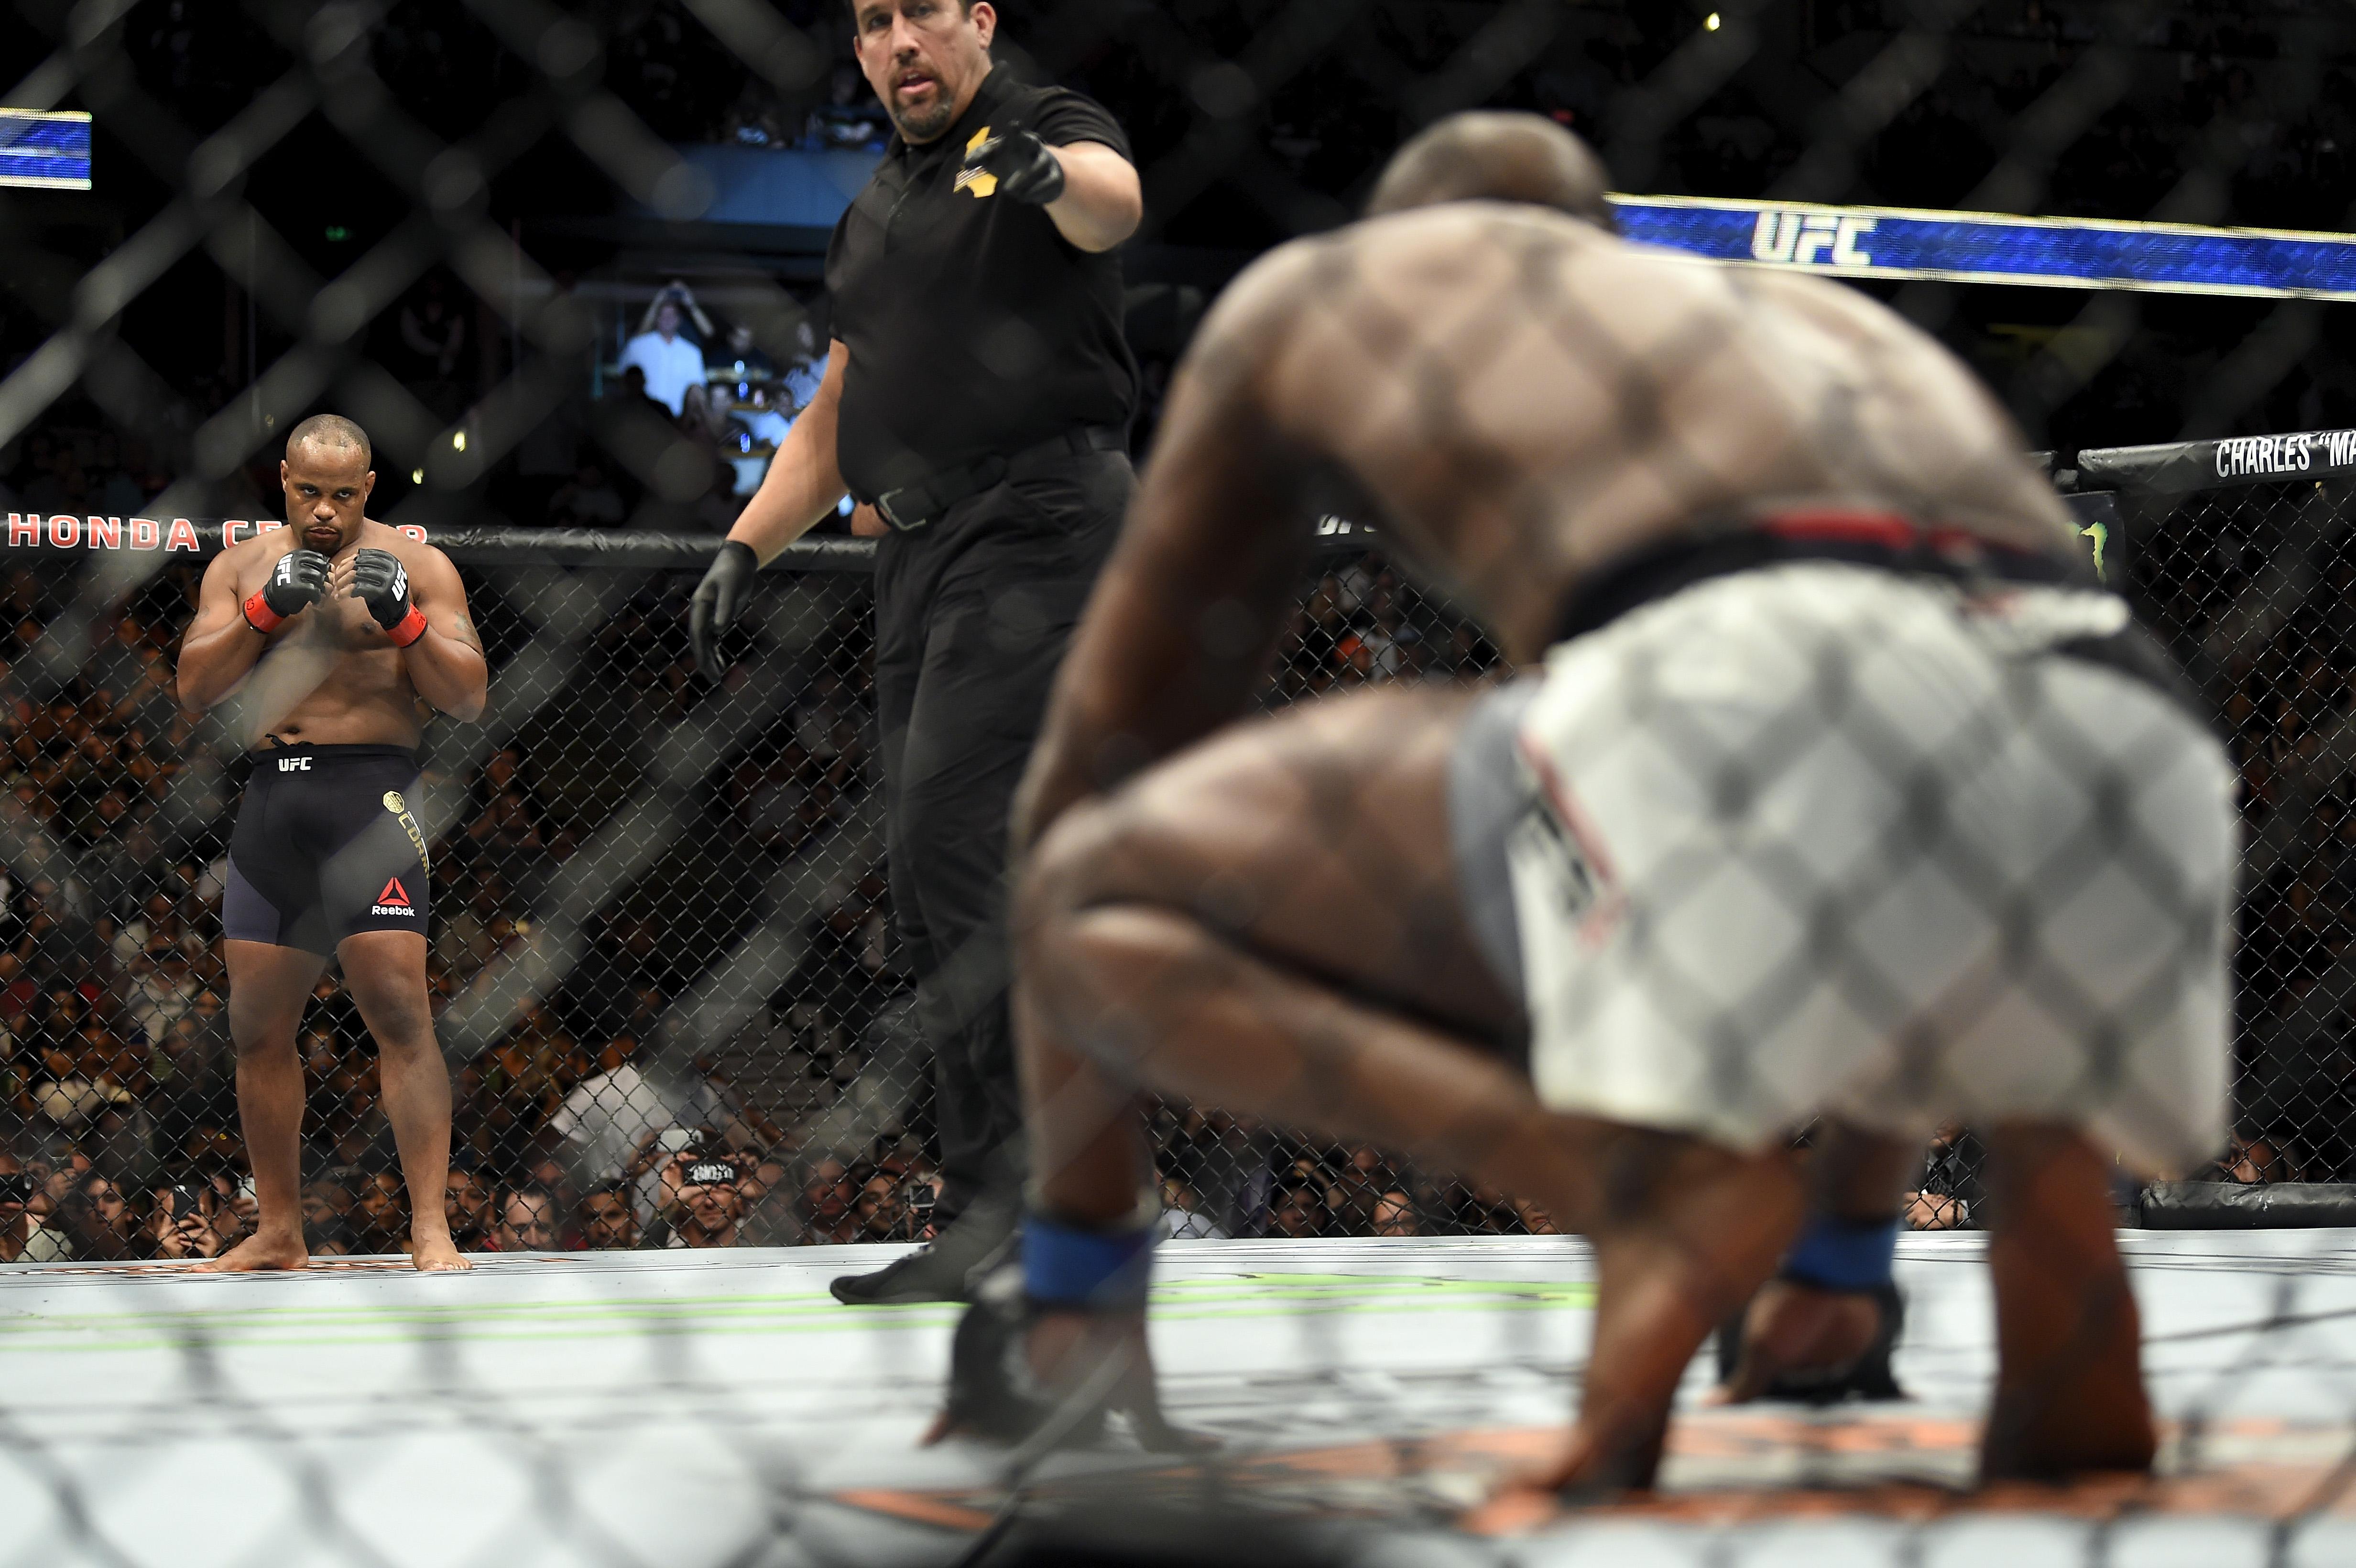 UFC 214: Cormier v Jones 2